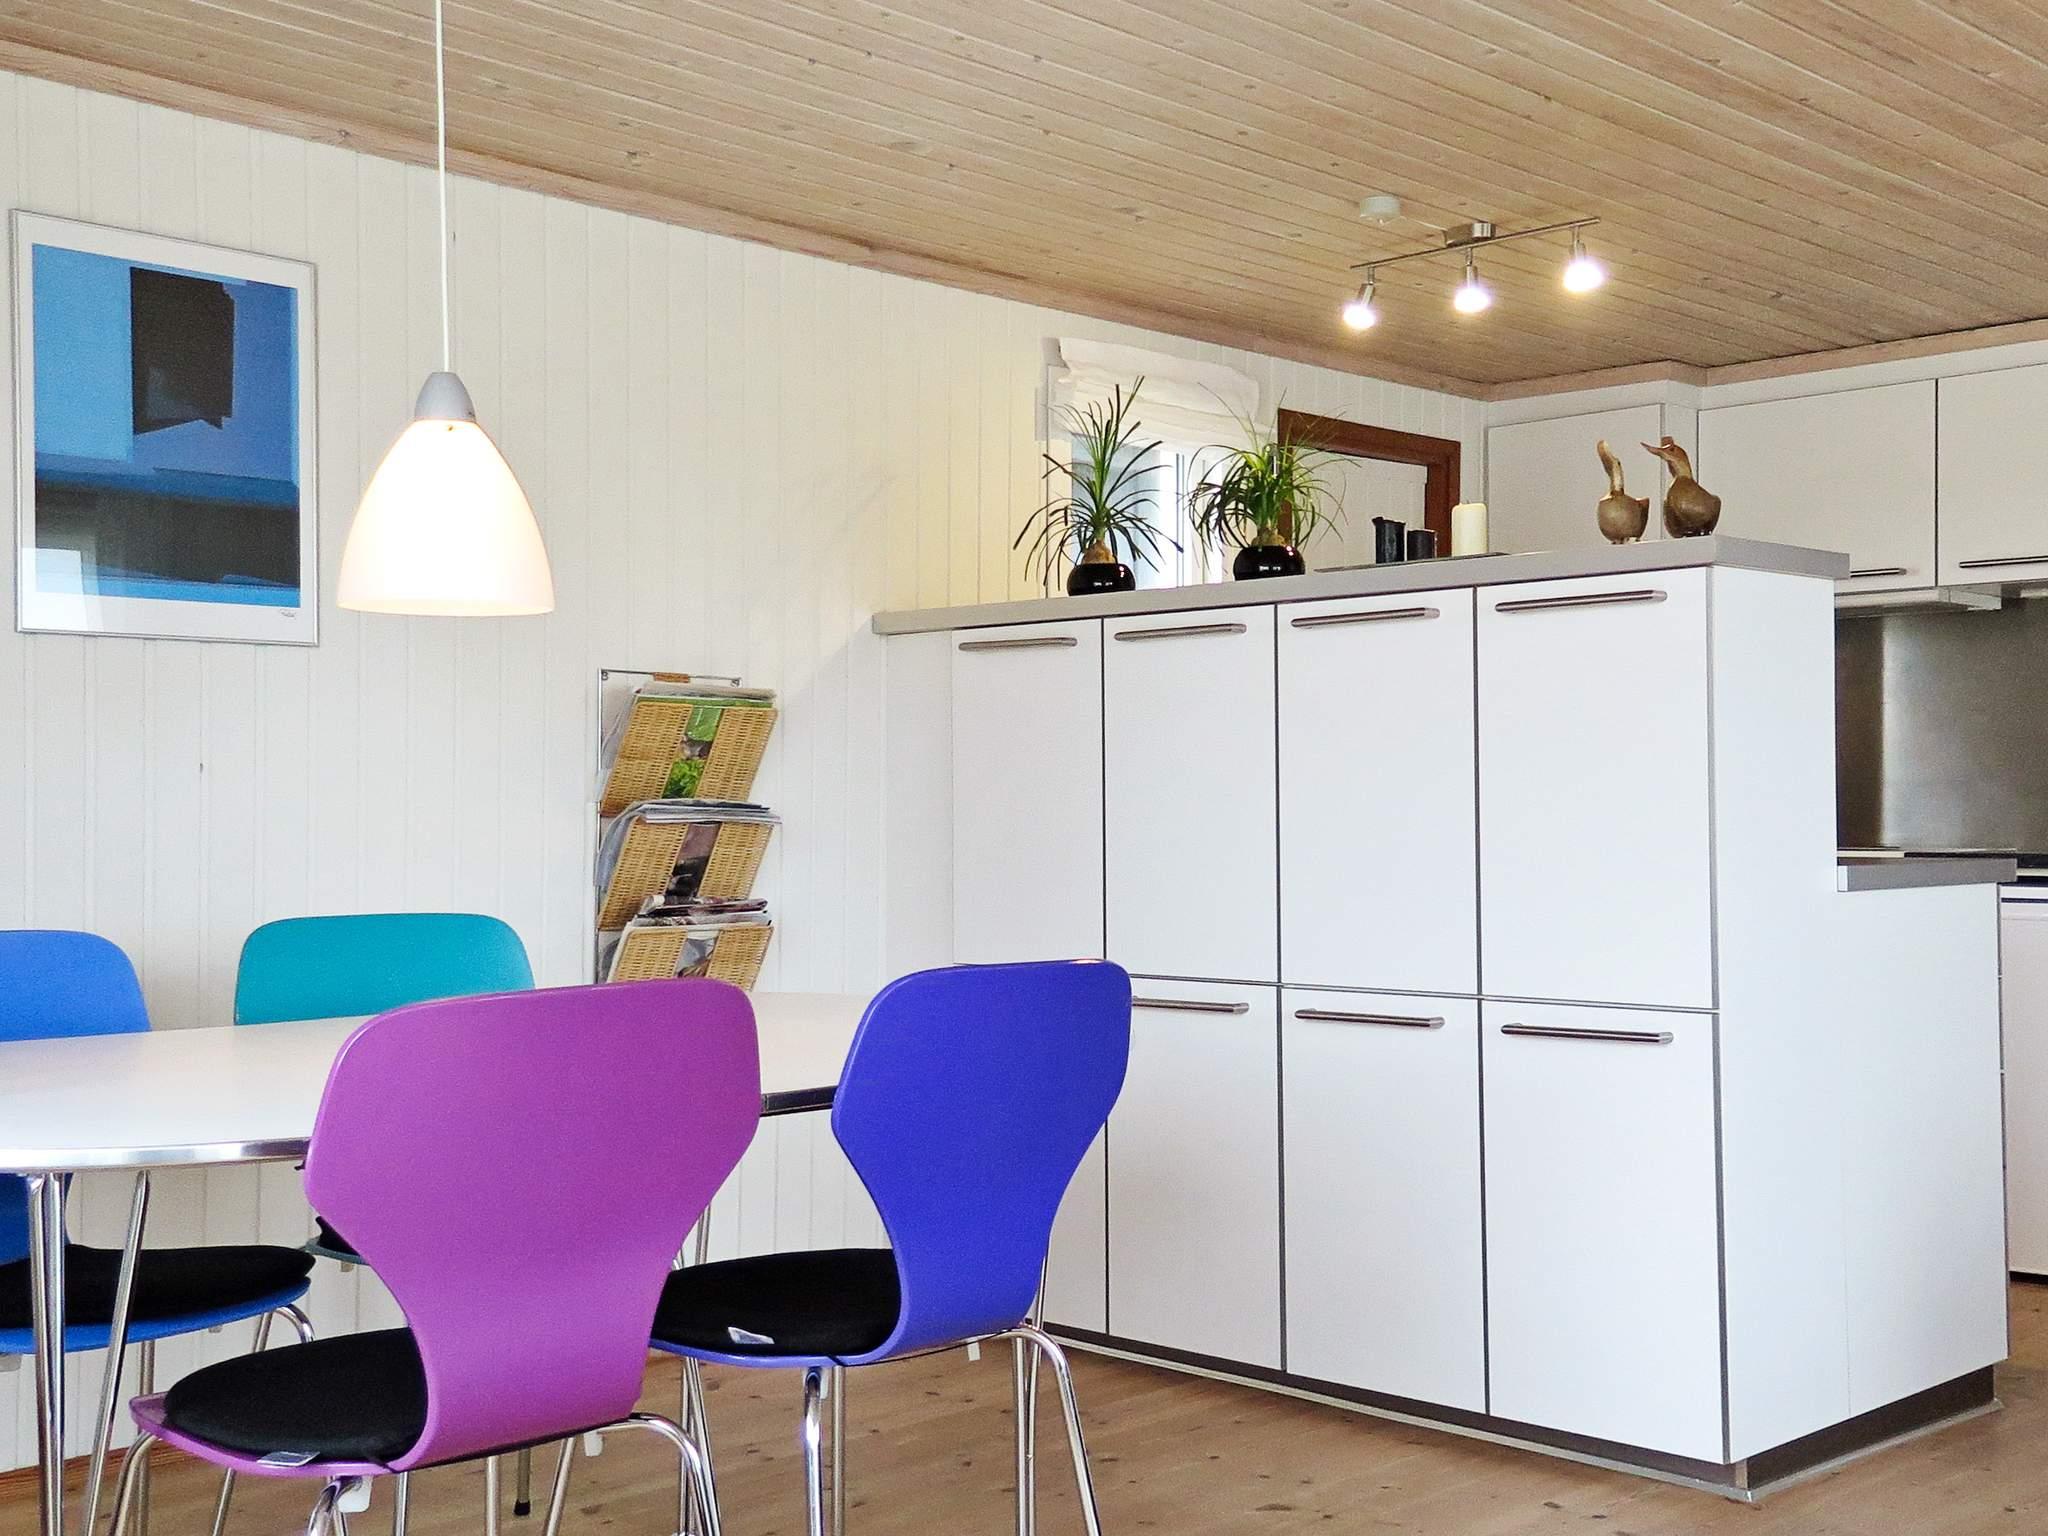 Ferienhaus Vrist (293960), Vrist, , Limfjord, Dänemark, Bild 6